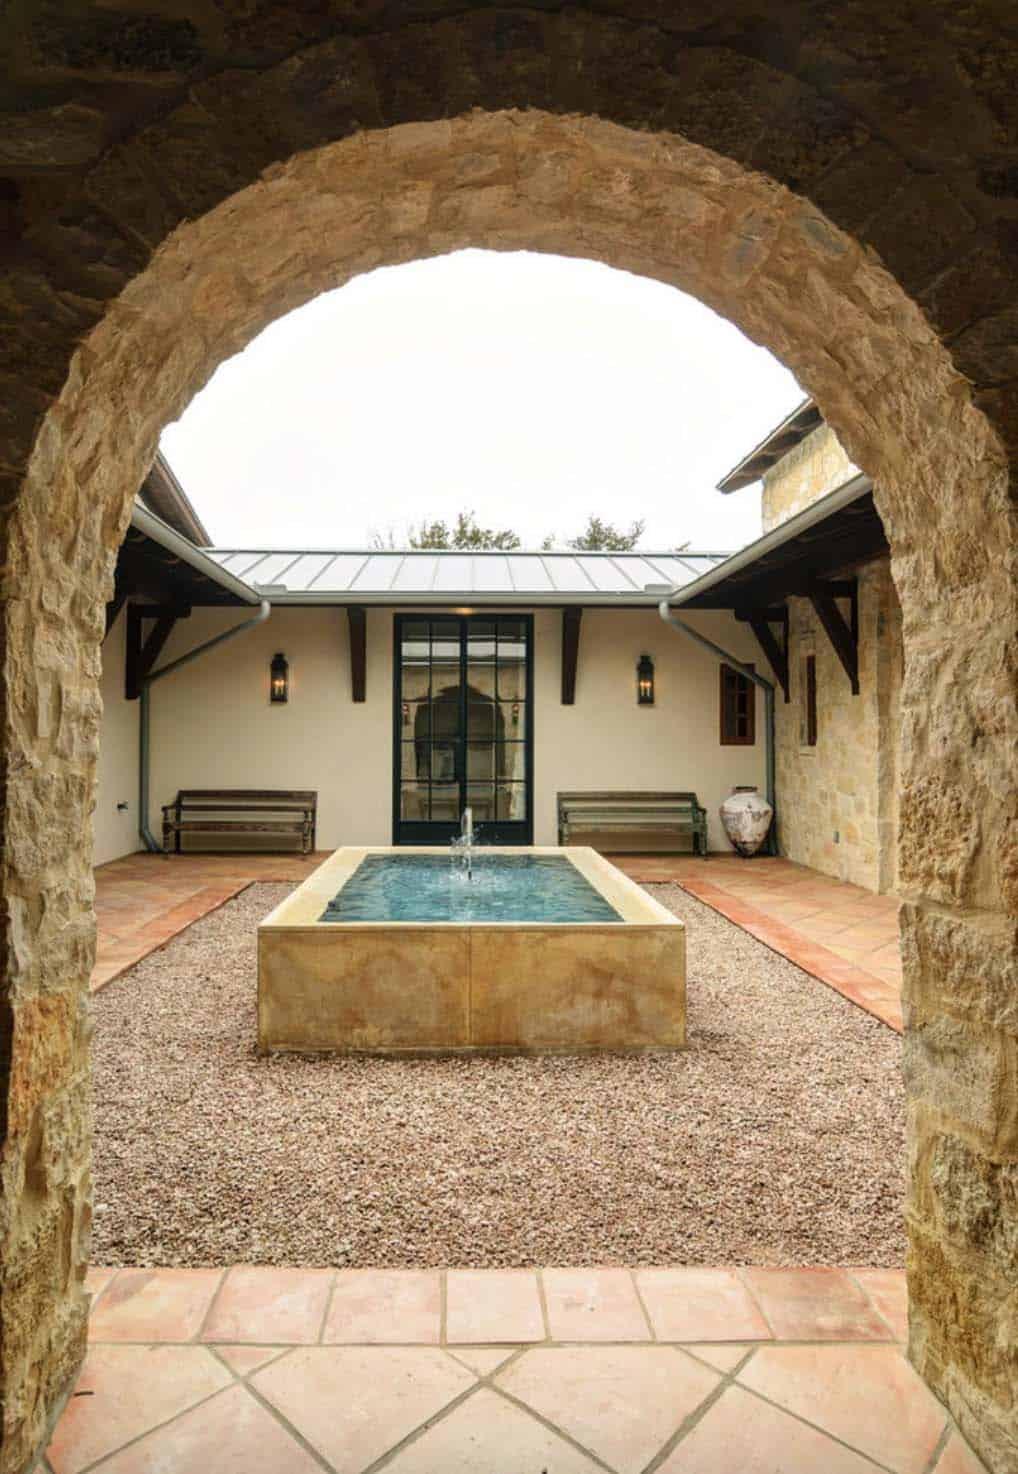 Rustic Mediterranean Style Home Design-04-1 Kindesign